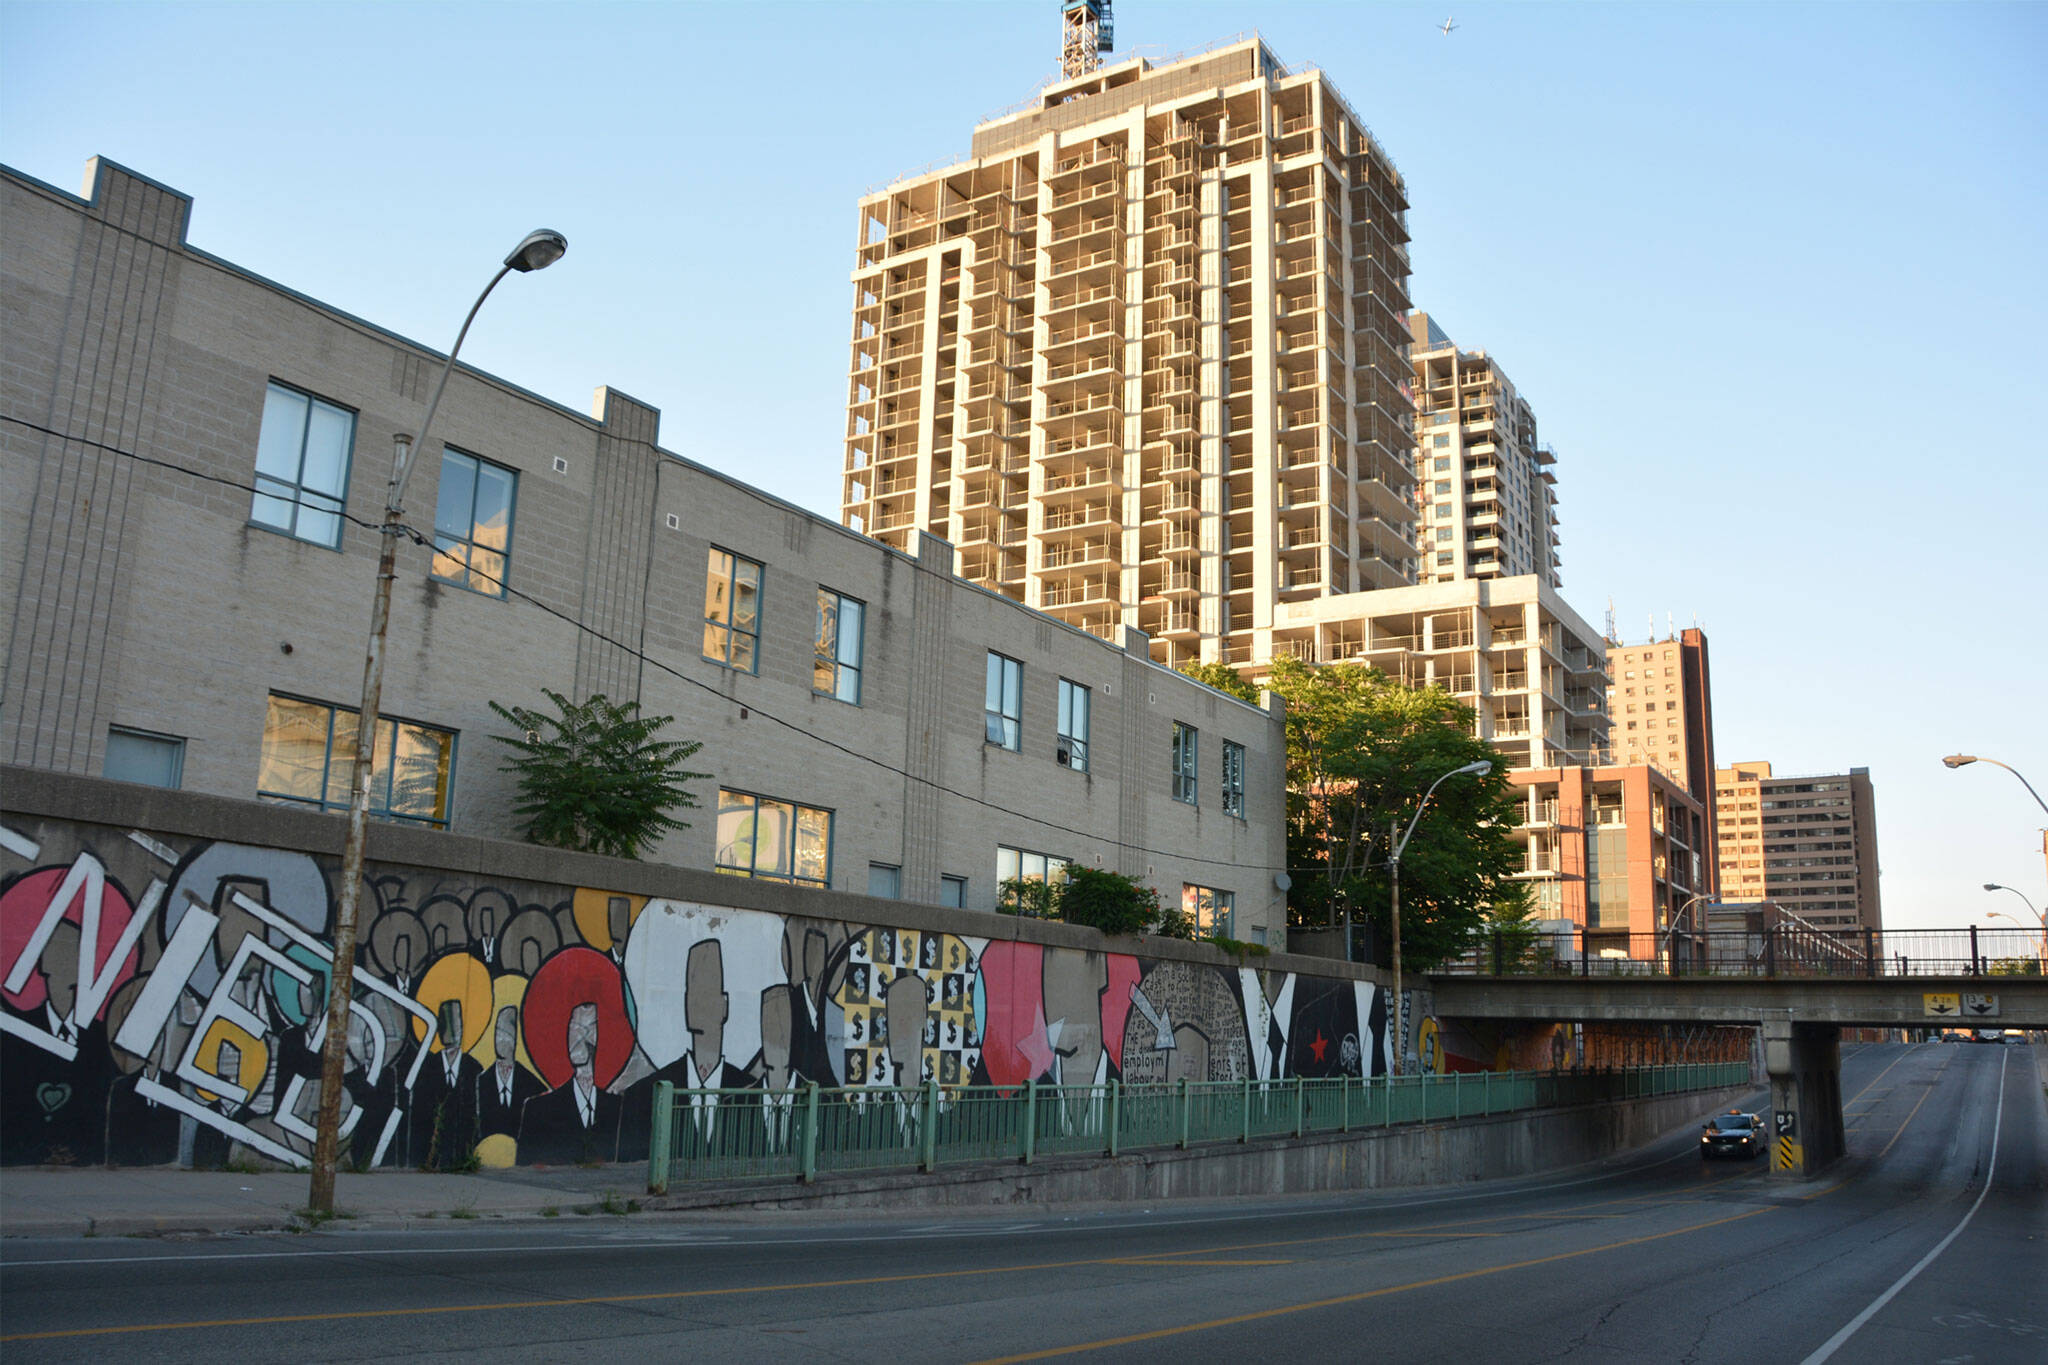 toronto desirable neighbourhoods